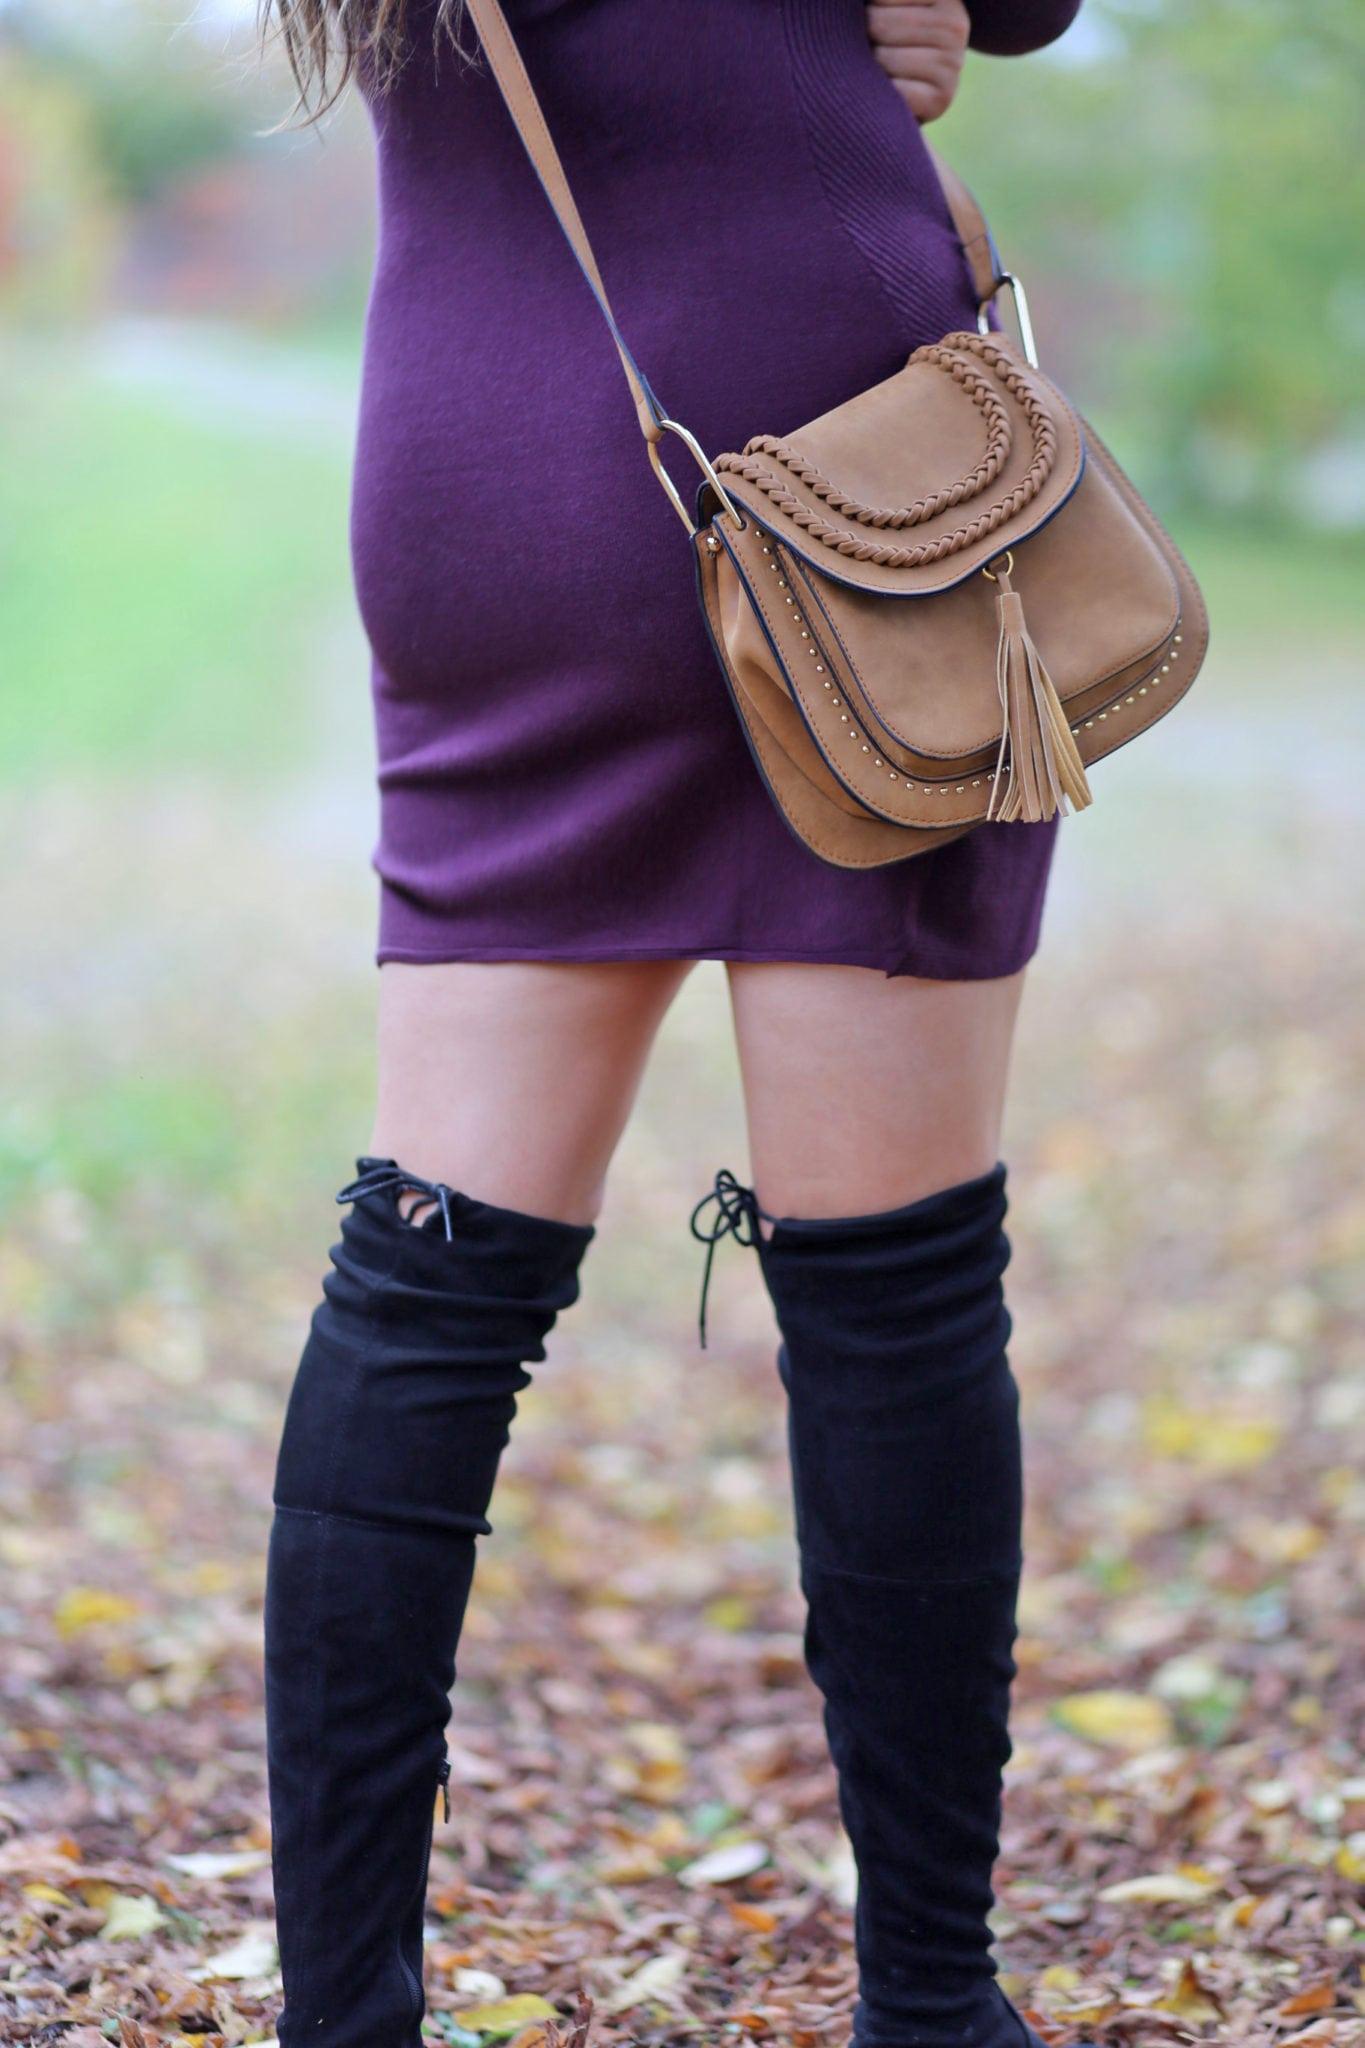 identical chloe designer bag dupe | comfortable over the knee boots | Mash Elle style blogger